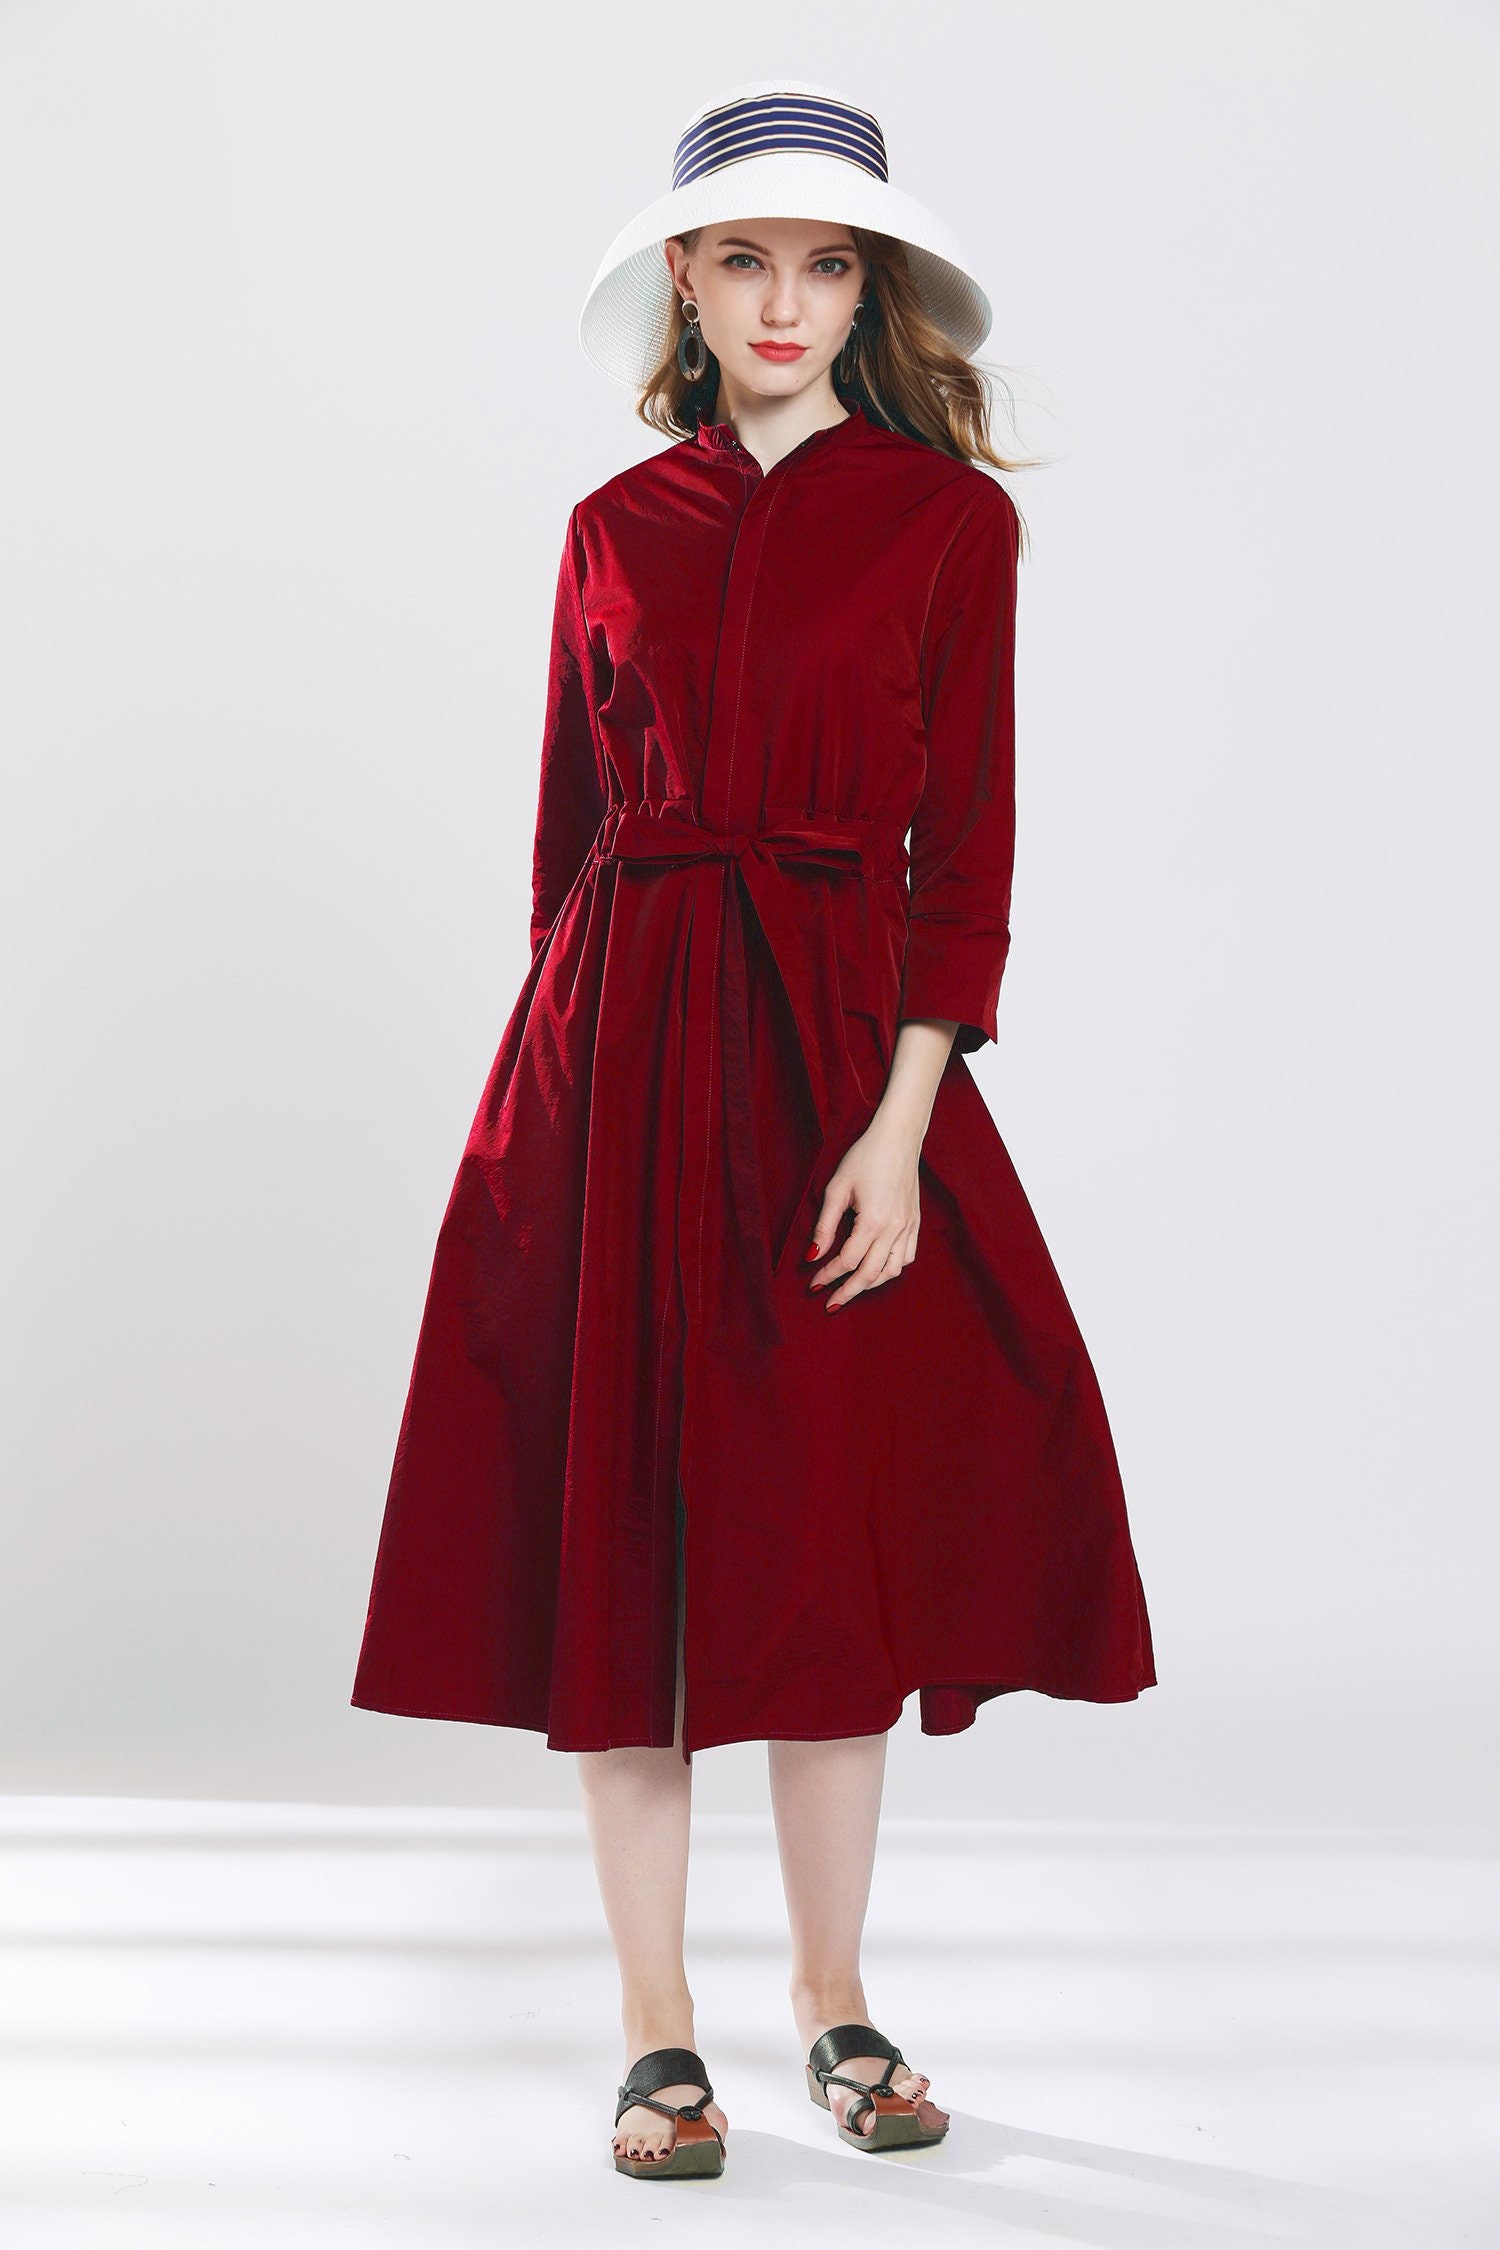 Burgundy trench coat plus size dress tunic spring coats oversize drawstring  jackets burgundy outwear custom made wind breaker dust coat